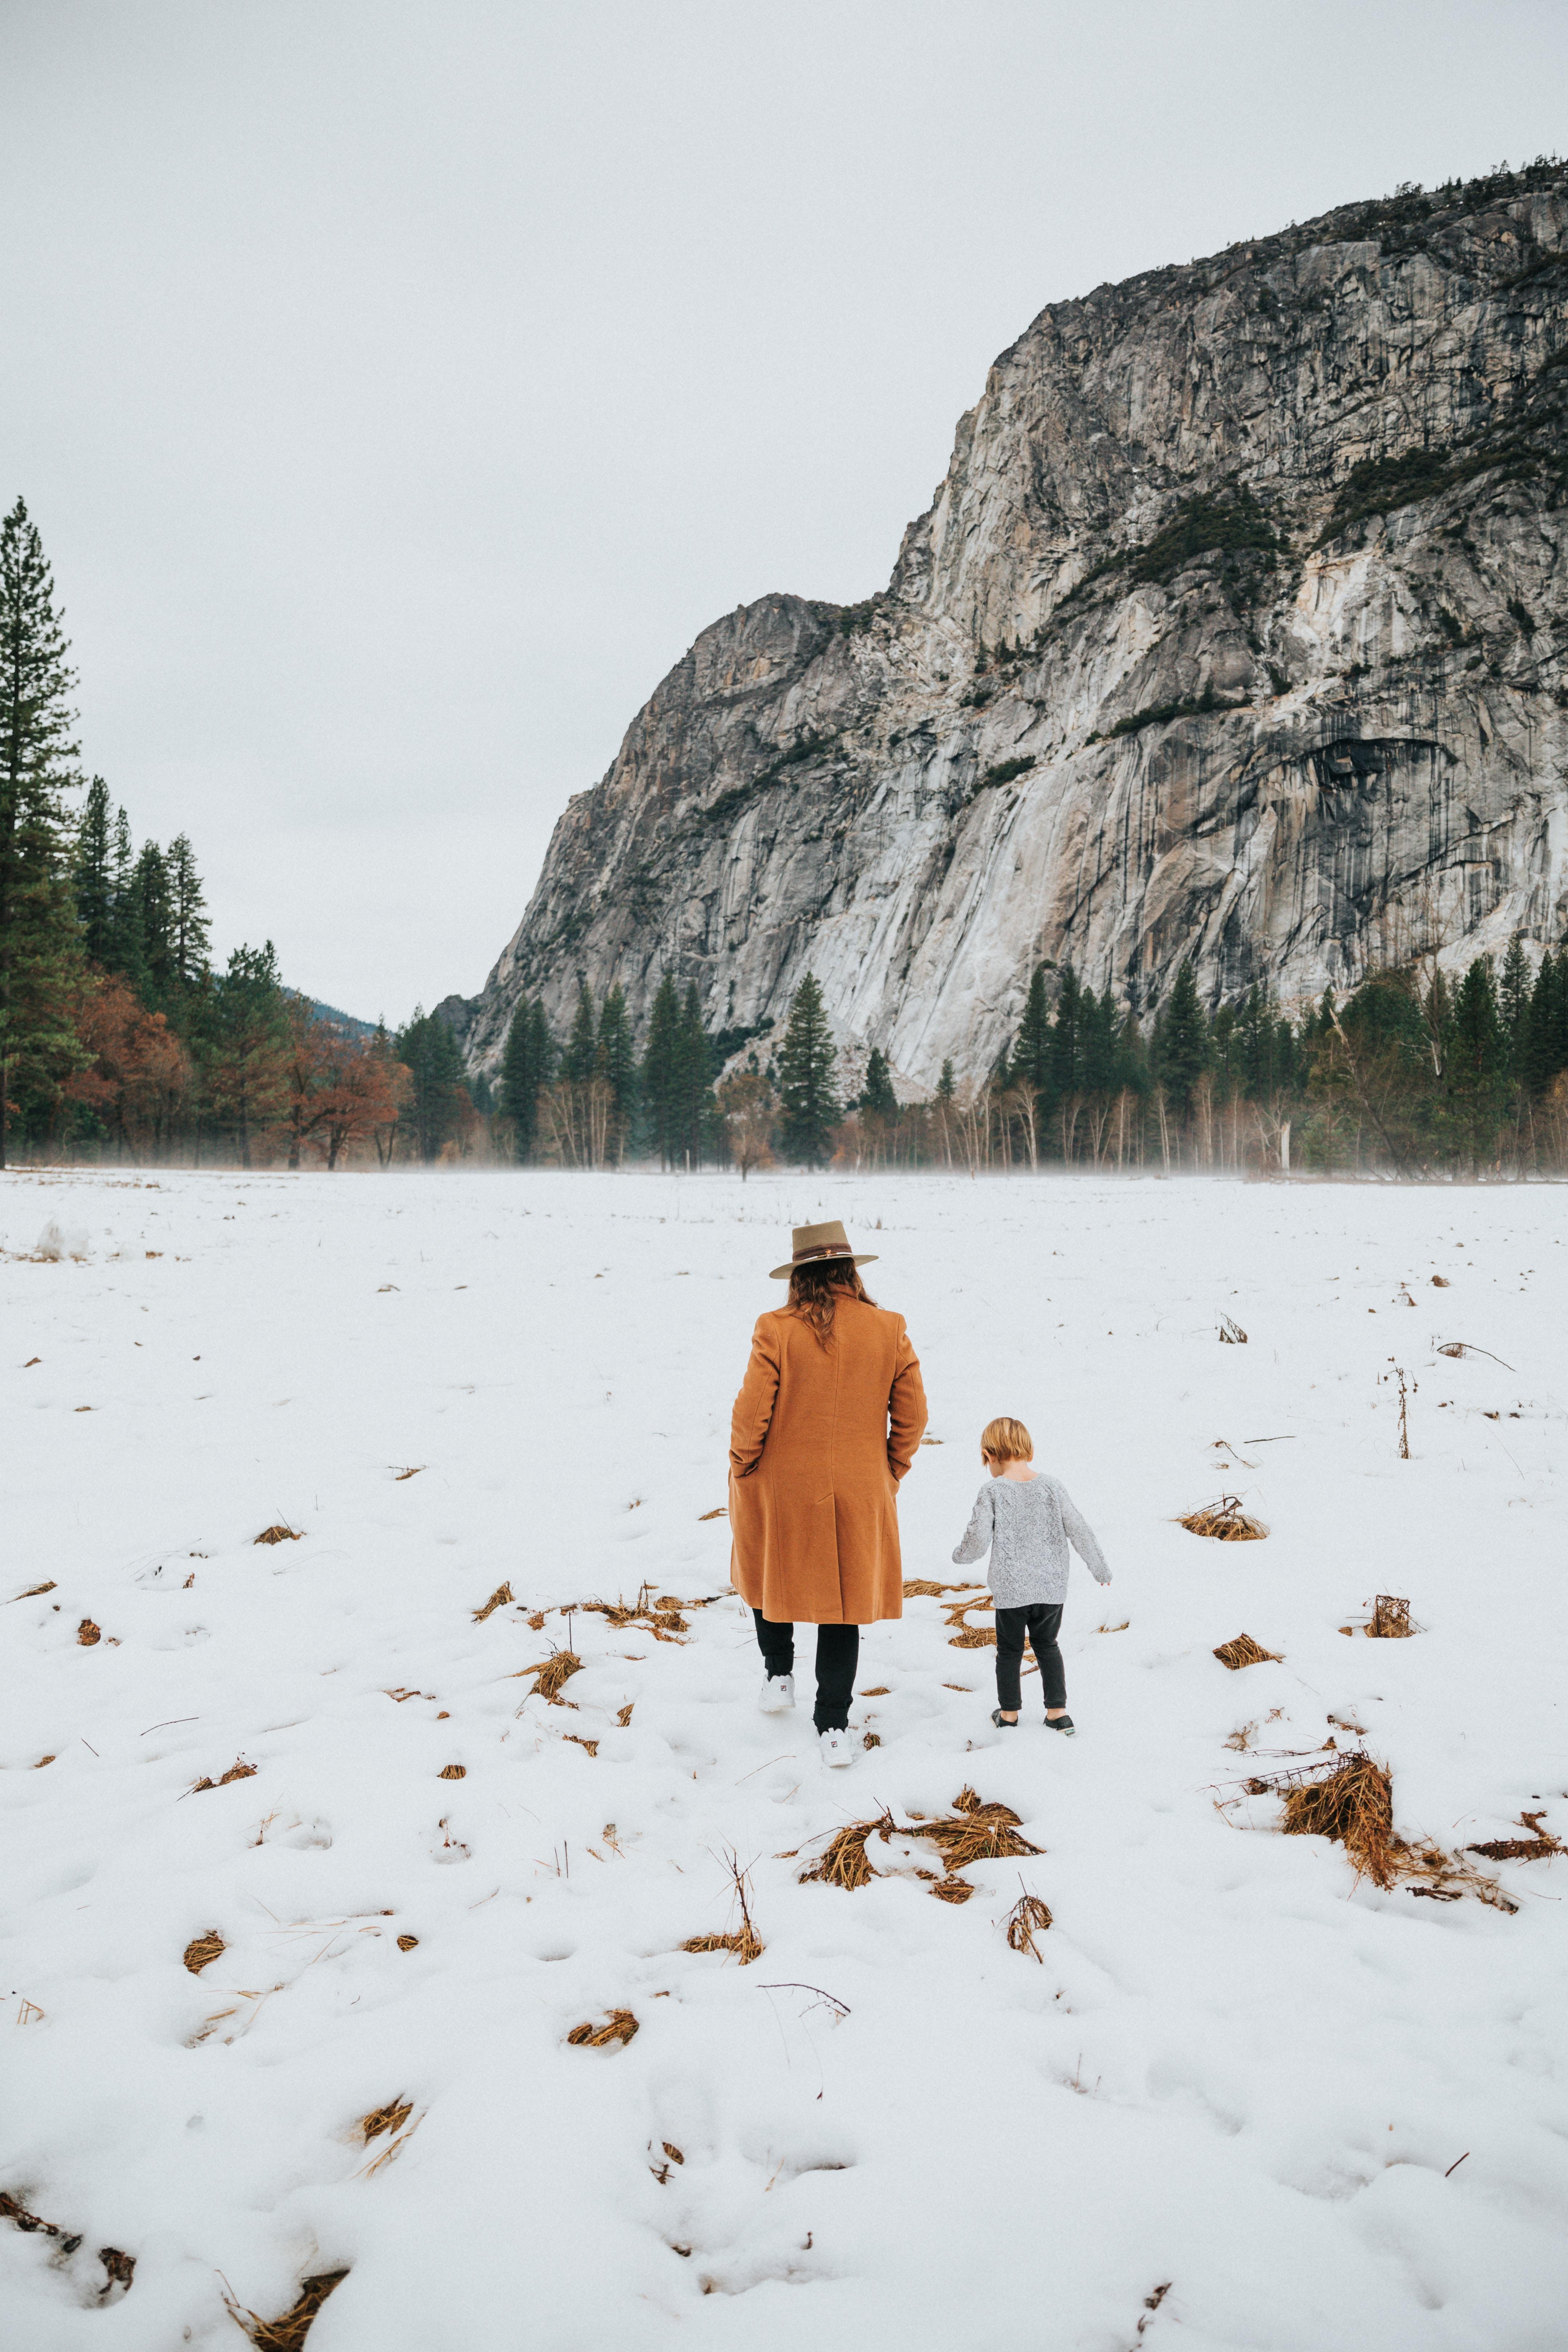 124093 descargar fondo de pantalla Miscelánea, Misceláneo, Personas, Montaña, Nieve, Invierno, Naturaleza, Paseo: protectores de pantalla e imágenes gratis